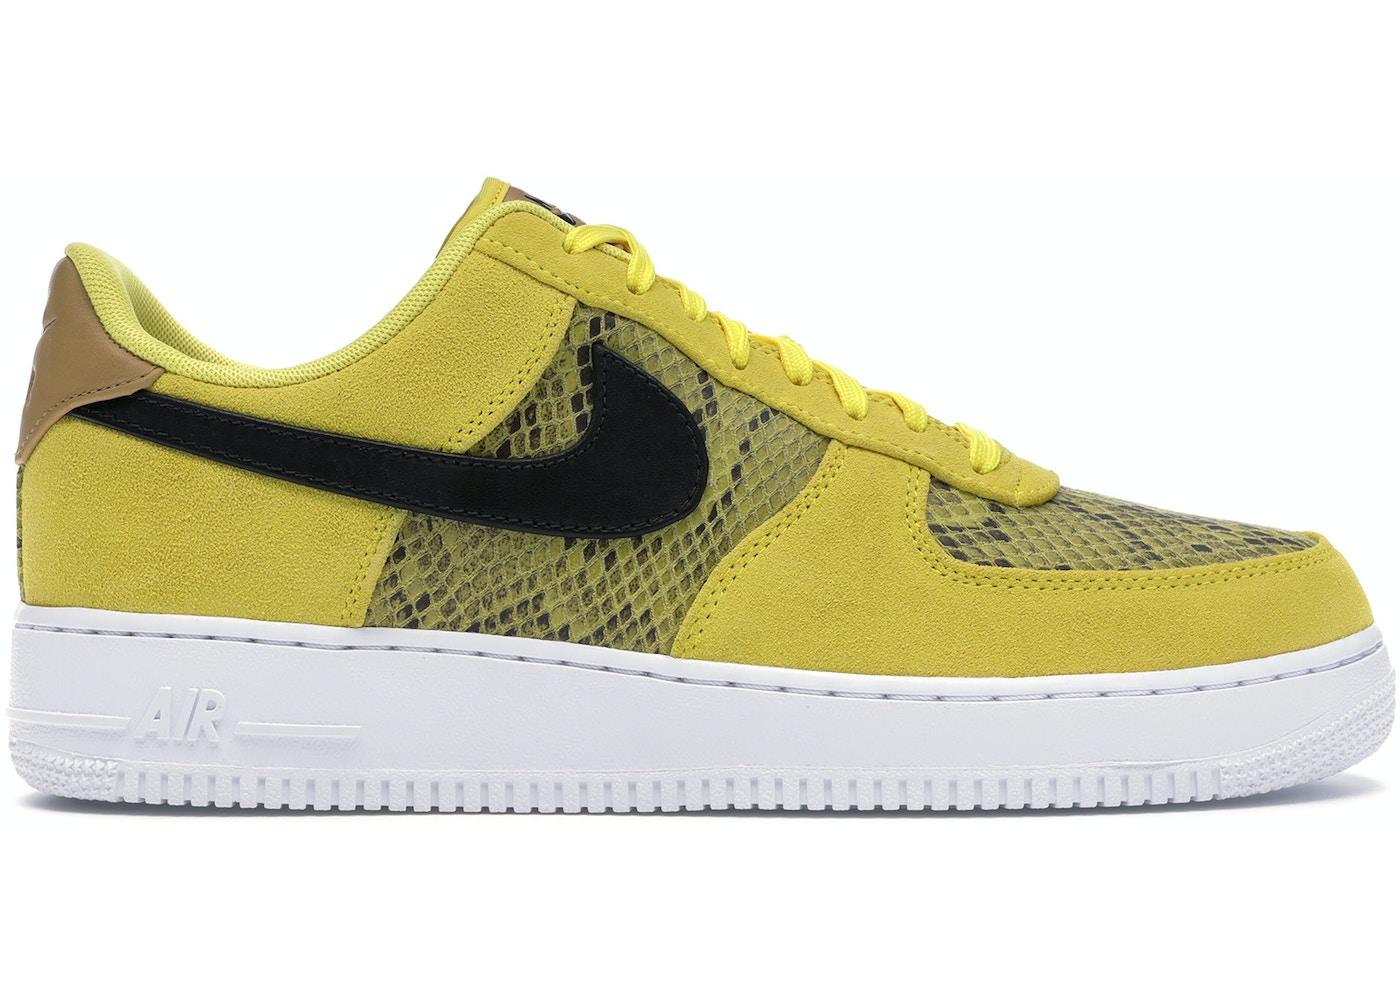 Nike Air Force 1 Low Yellow Snakeskin Bq4424 700